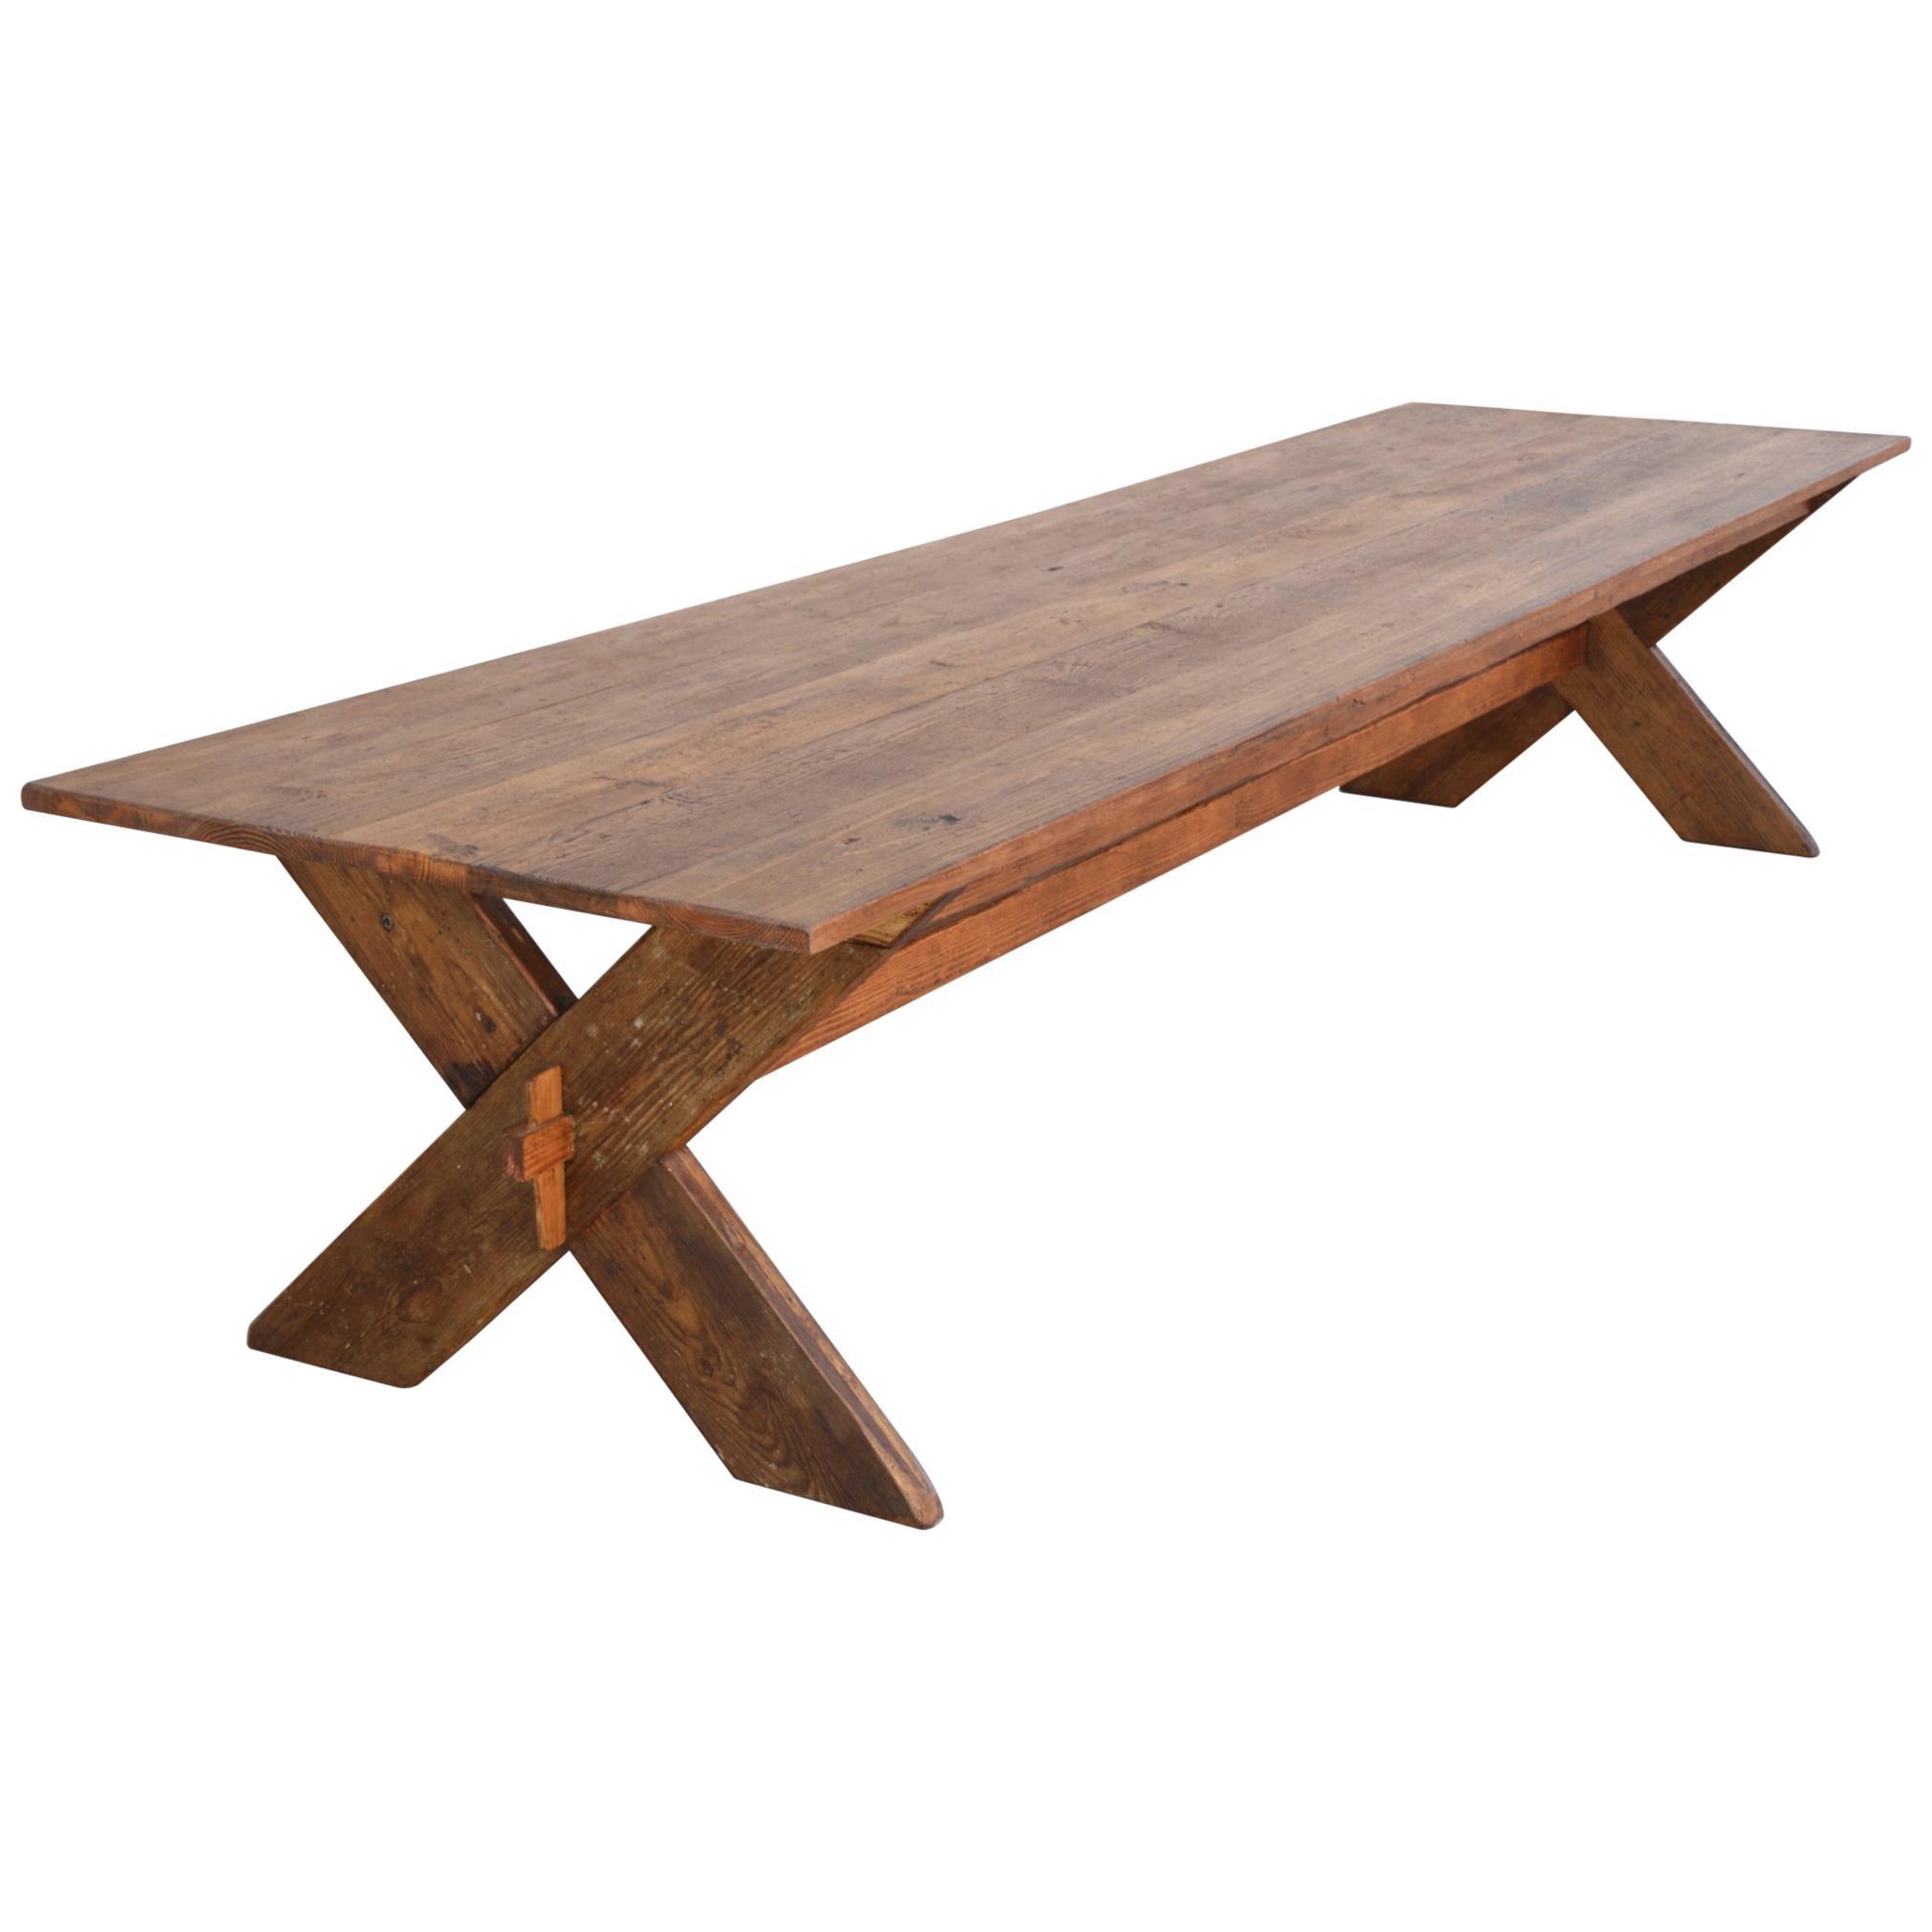 Custom X-Trestle Table in Reclaimed Heart Pine